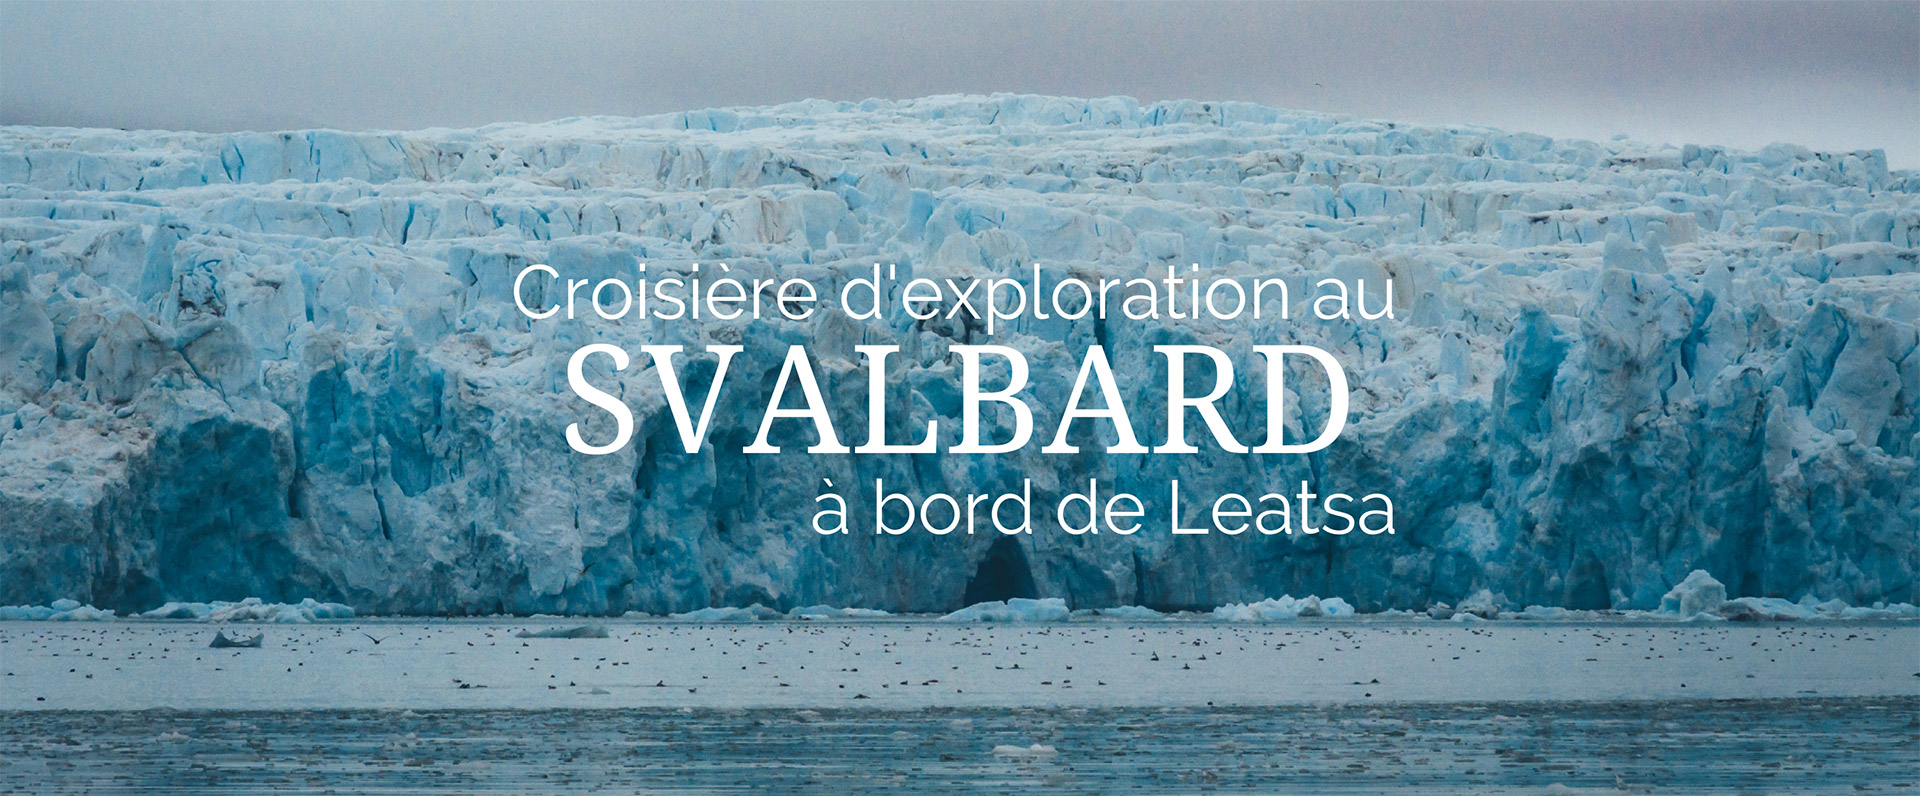 POLAR-SAILS_2019_Croisiere_Svalbard_v181101_FR-1